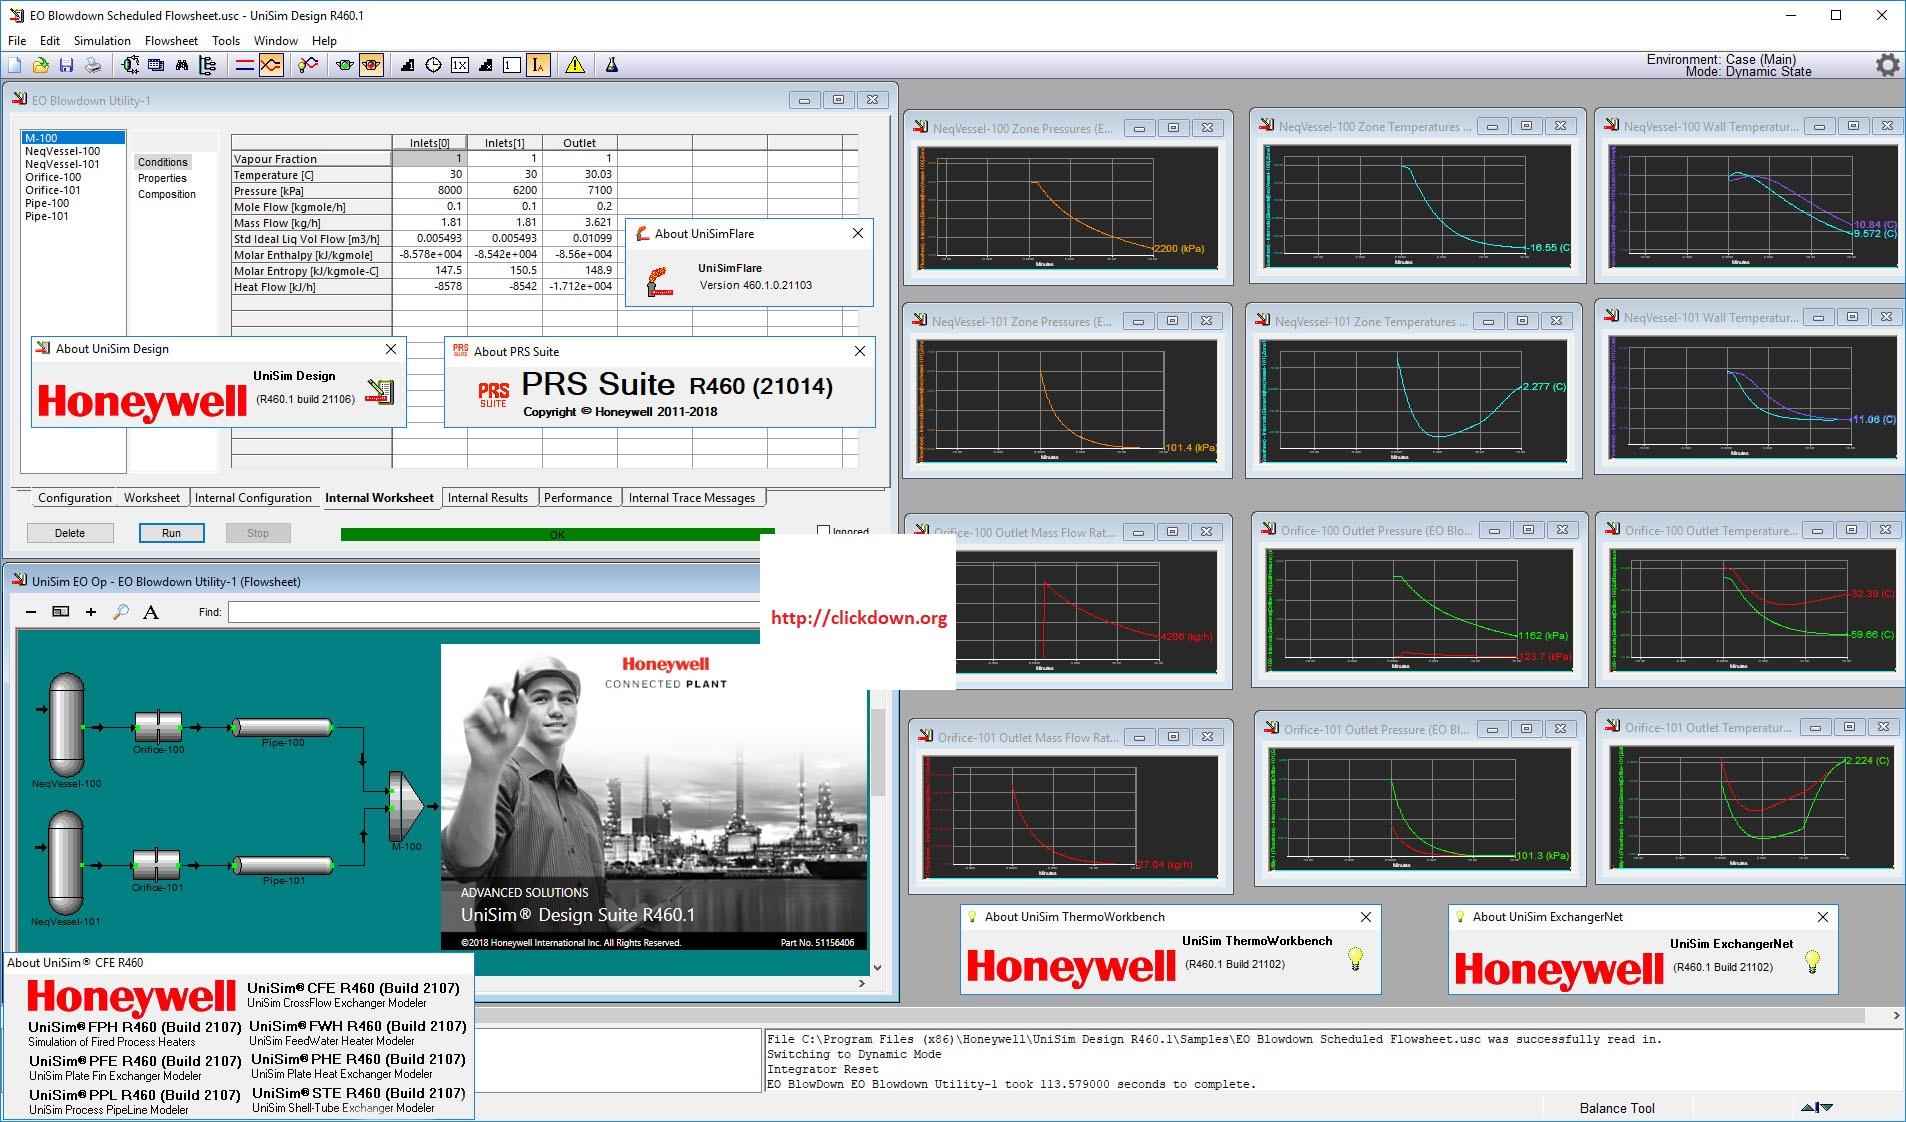 Working with Honeywell UniSim Design Suite R460.1 full license